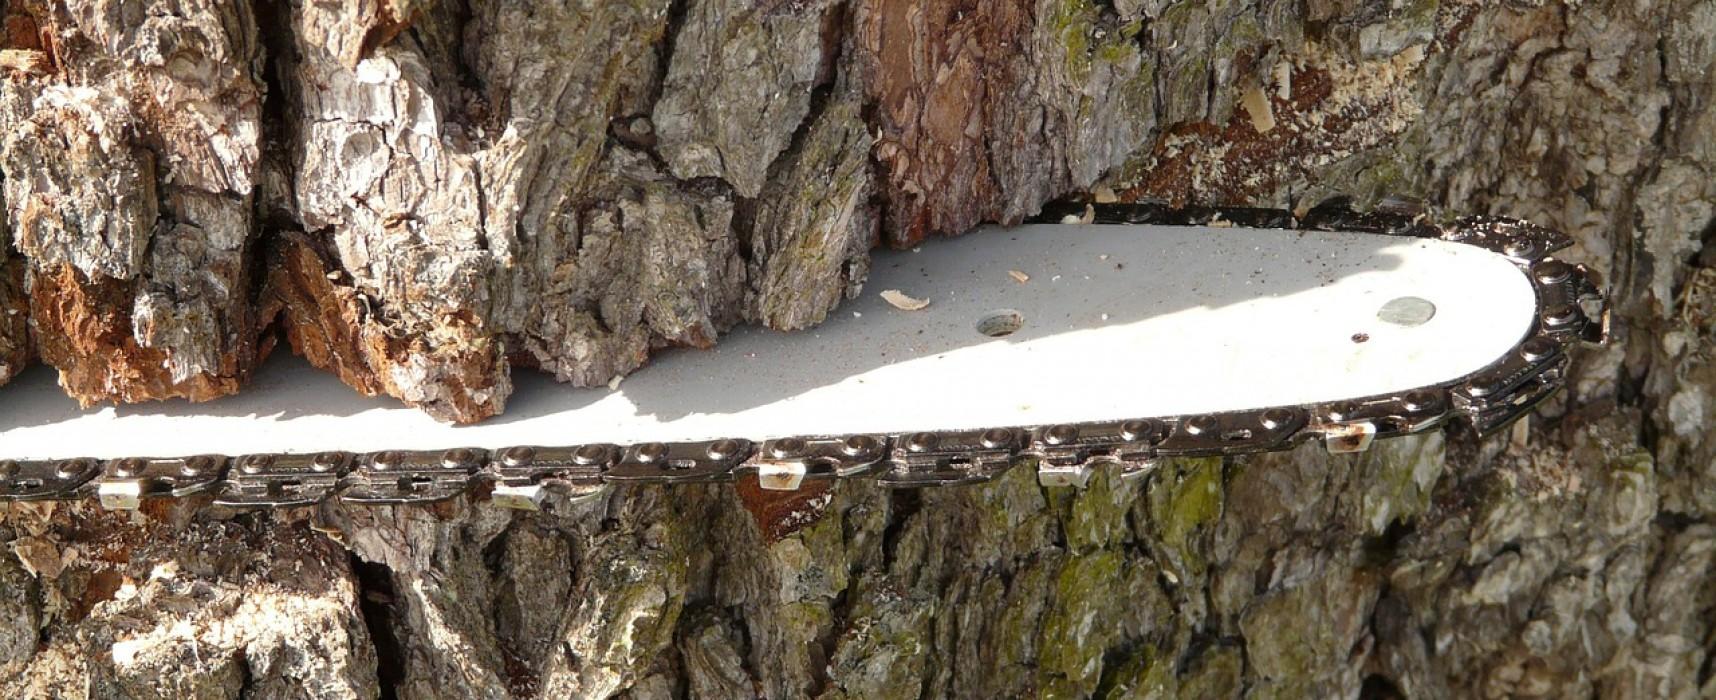 Holzschlag Sessellift im Tgomawald